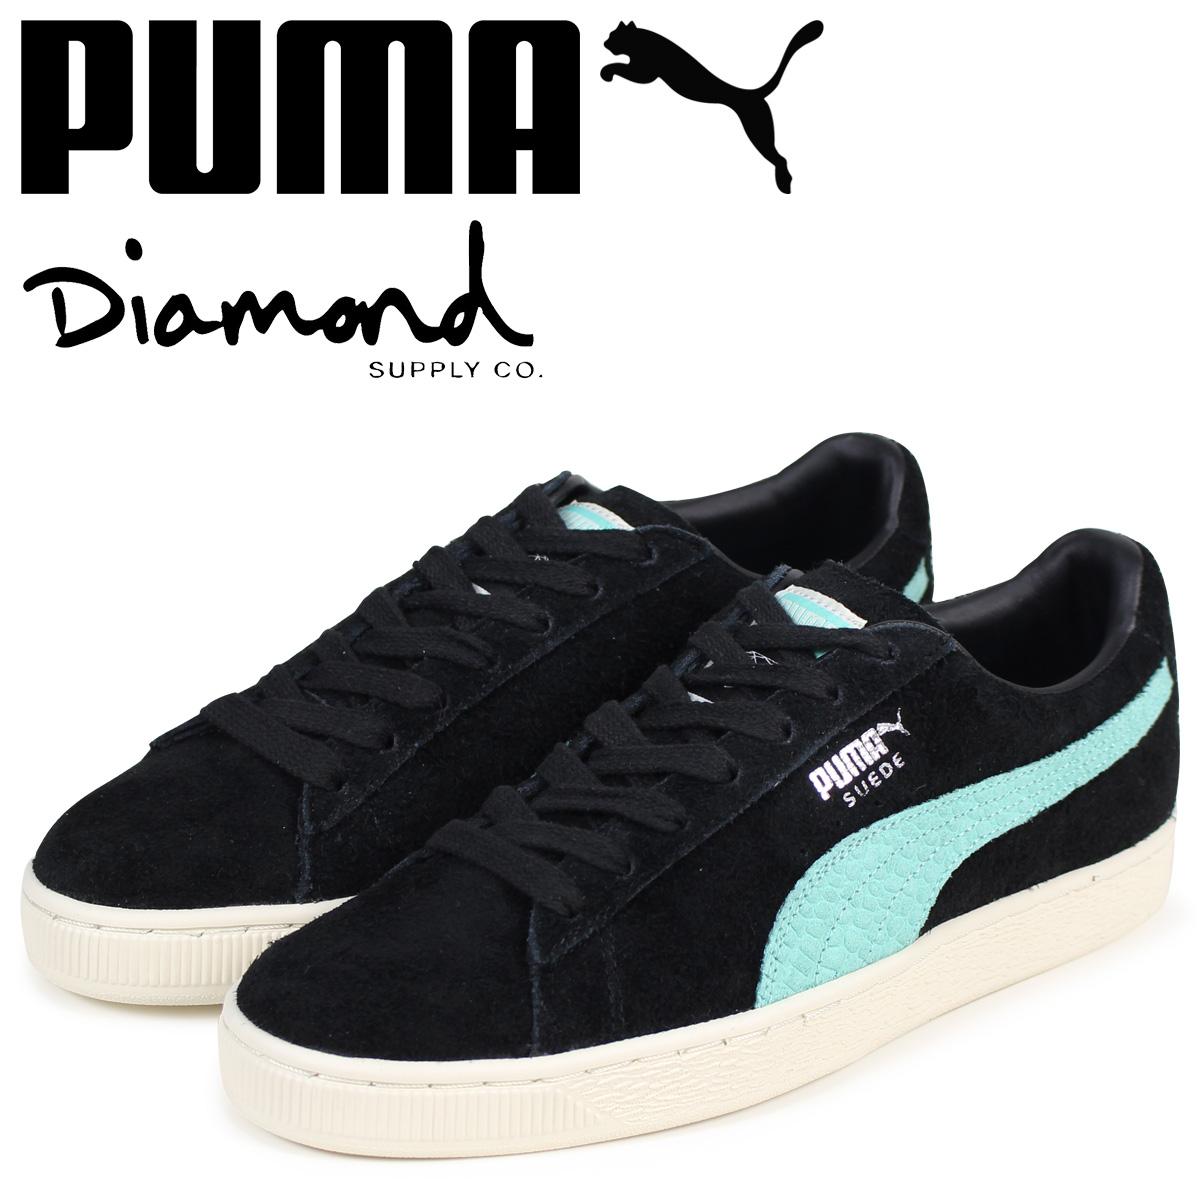 7e5406d027f3 PUMA Puma suede sneakers men diamond supply SUEDE DIAMOND collaboration  365